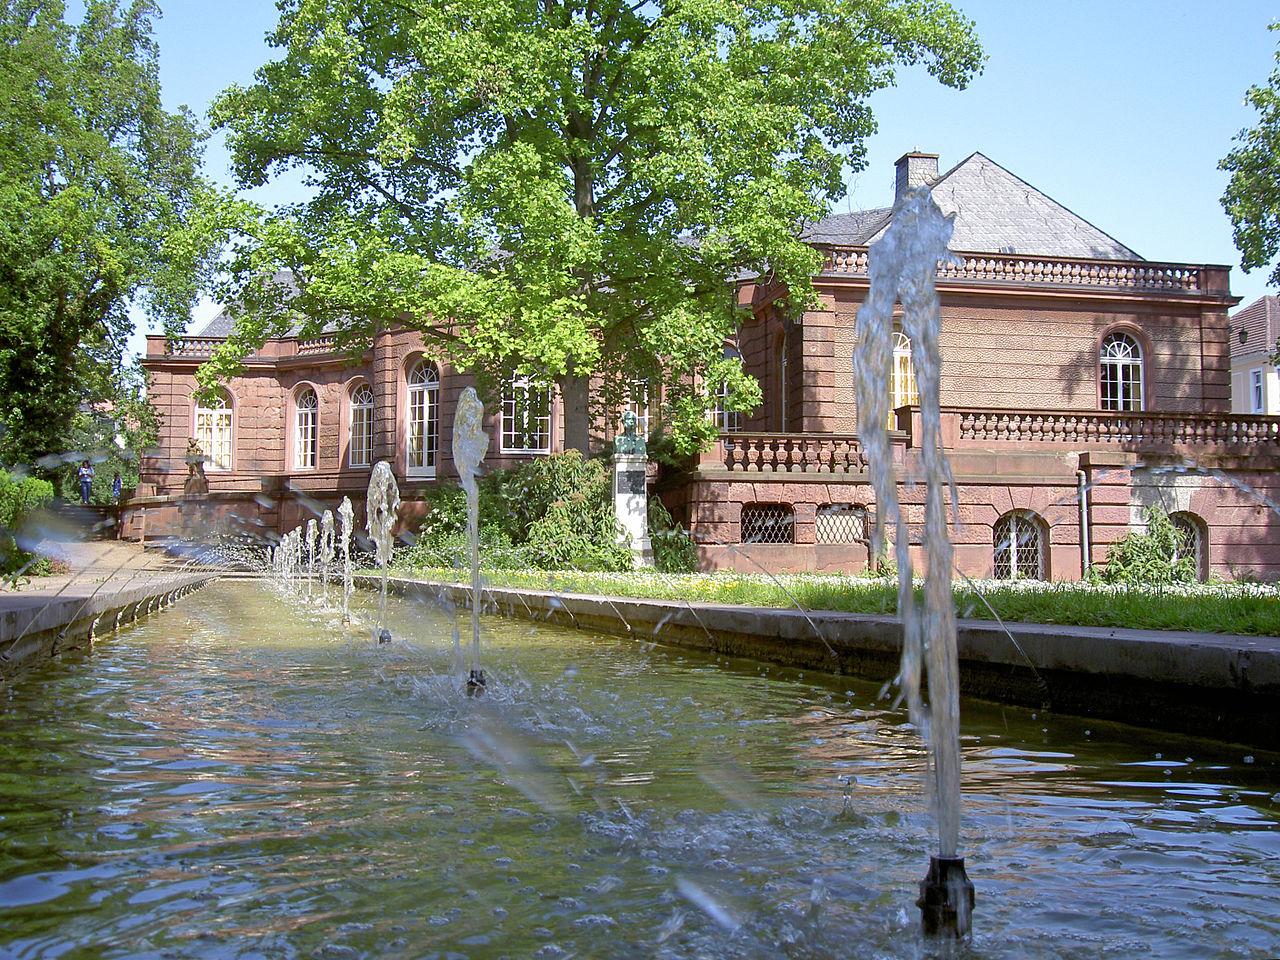 Bild Museum Heylshof Worms